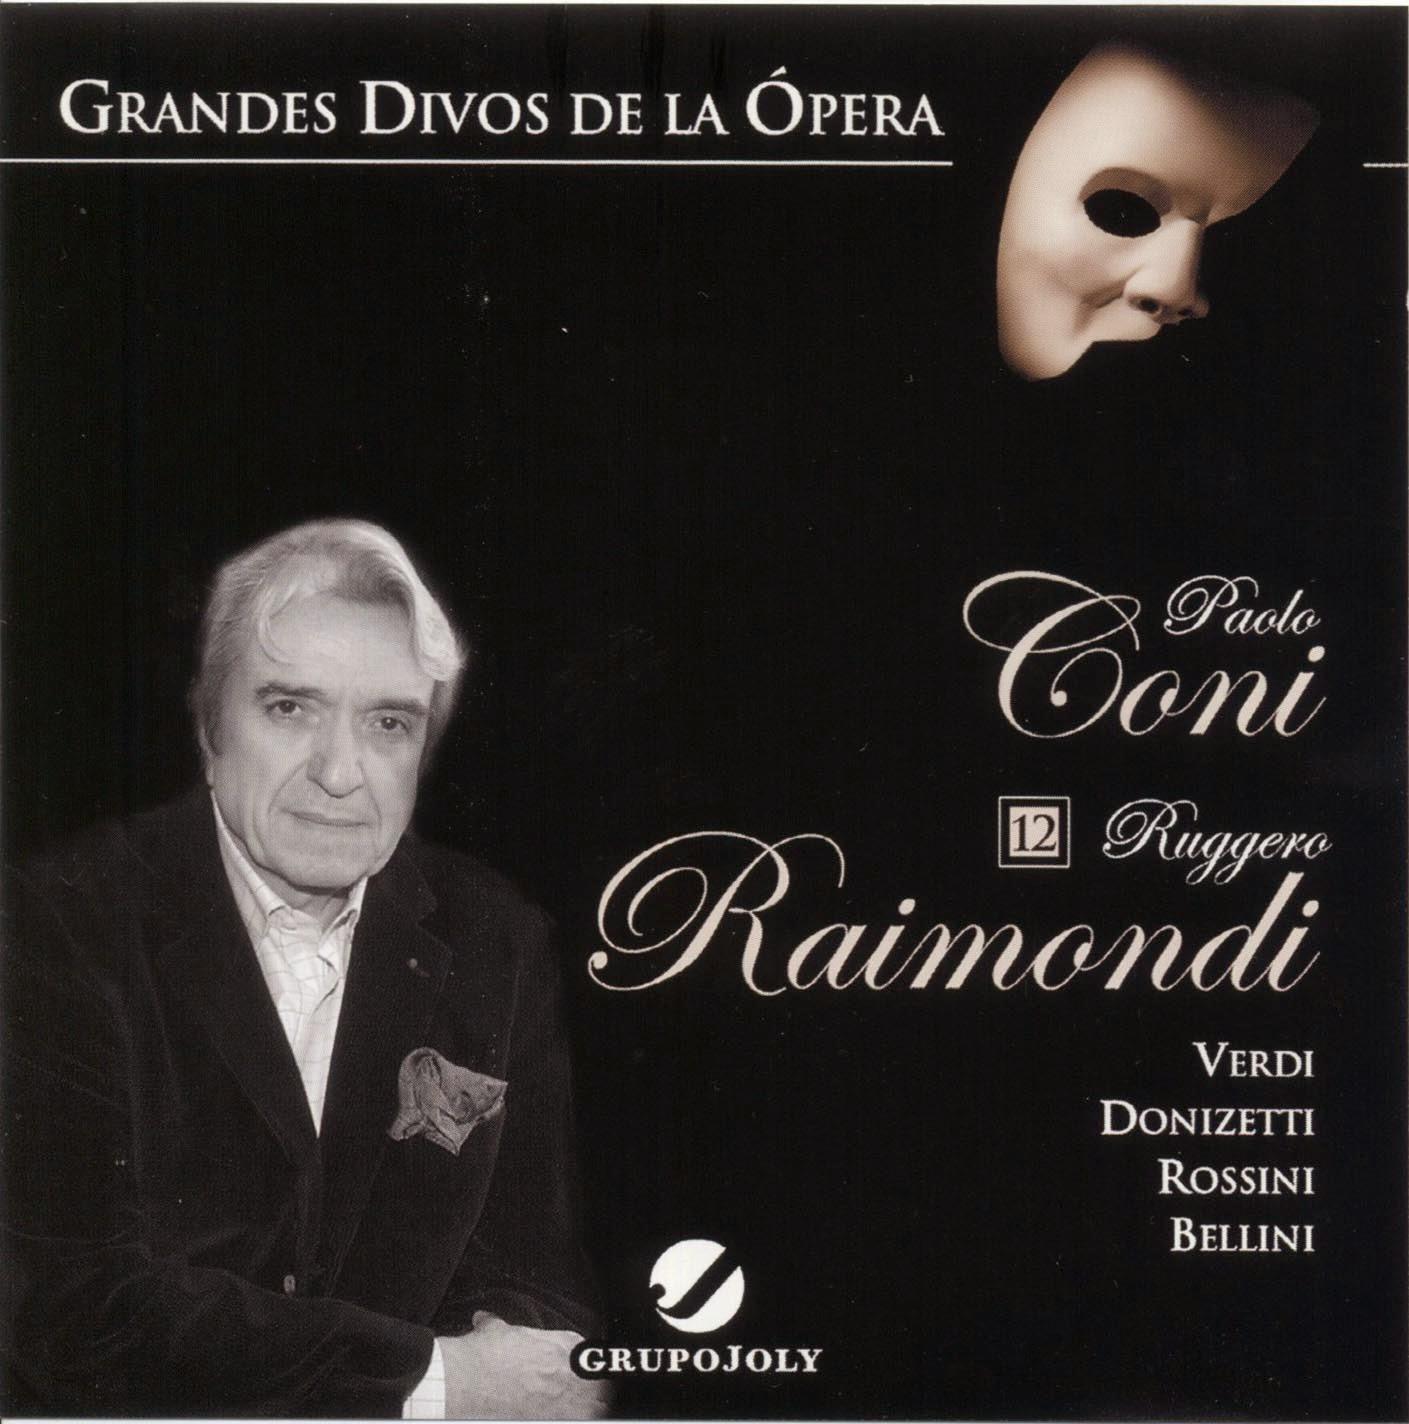 Grandes Divos de la Ópera-cd12-Paolo Coni & Ruggero Raimondi-carátula frontal